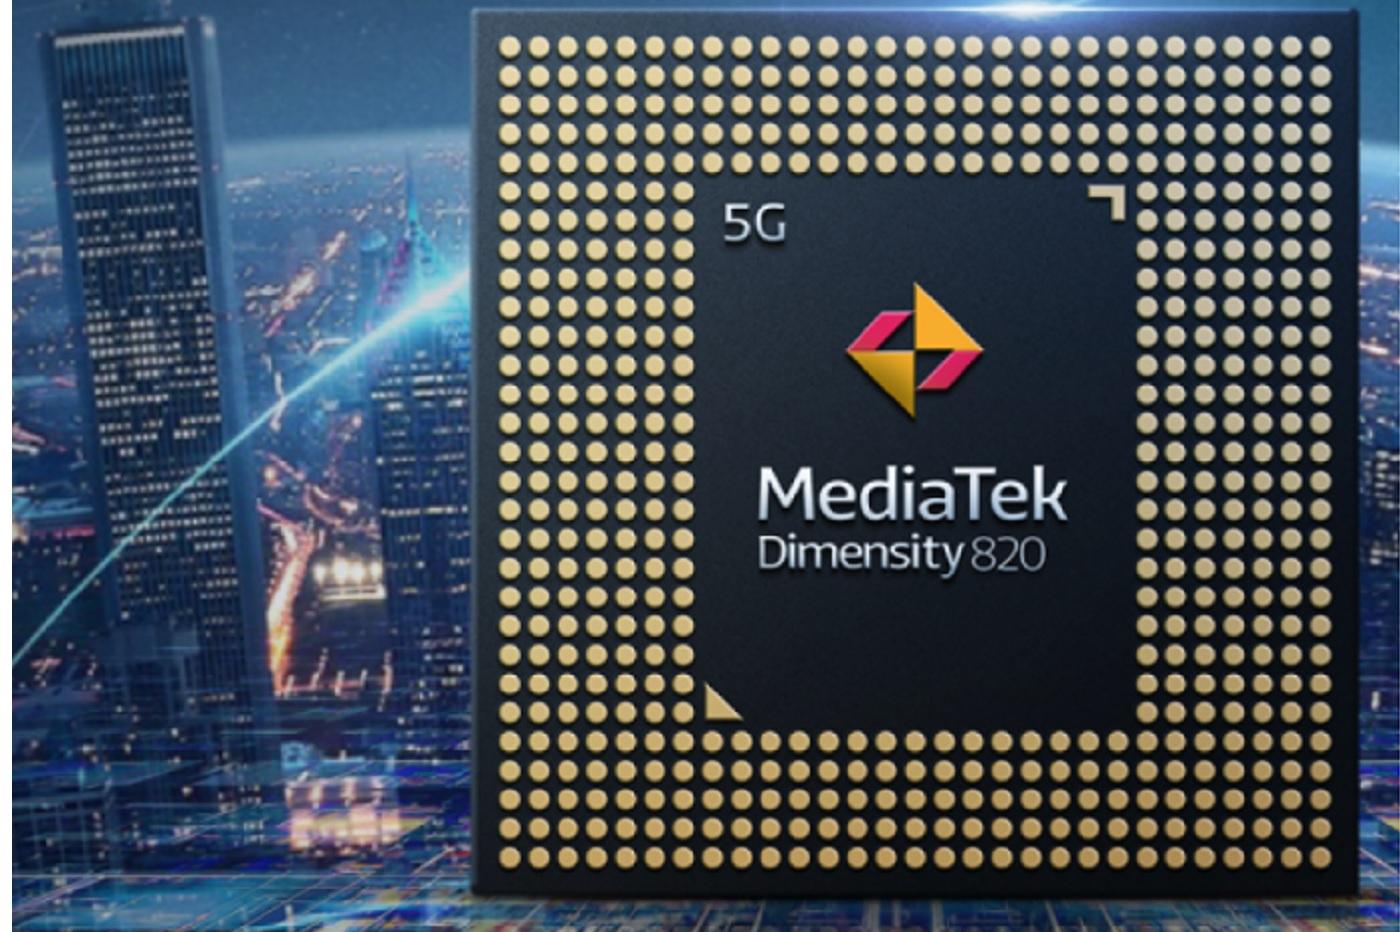 Le-Dimensity-820-de-Mediatek